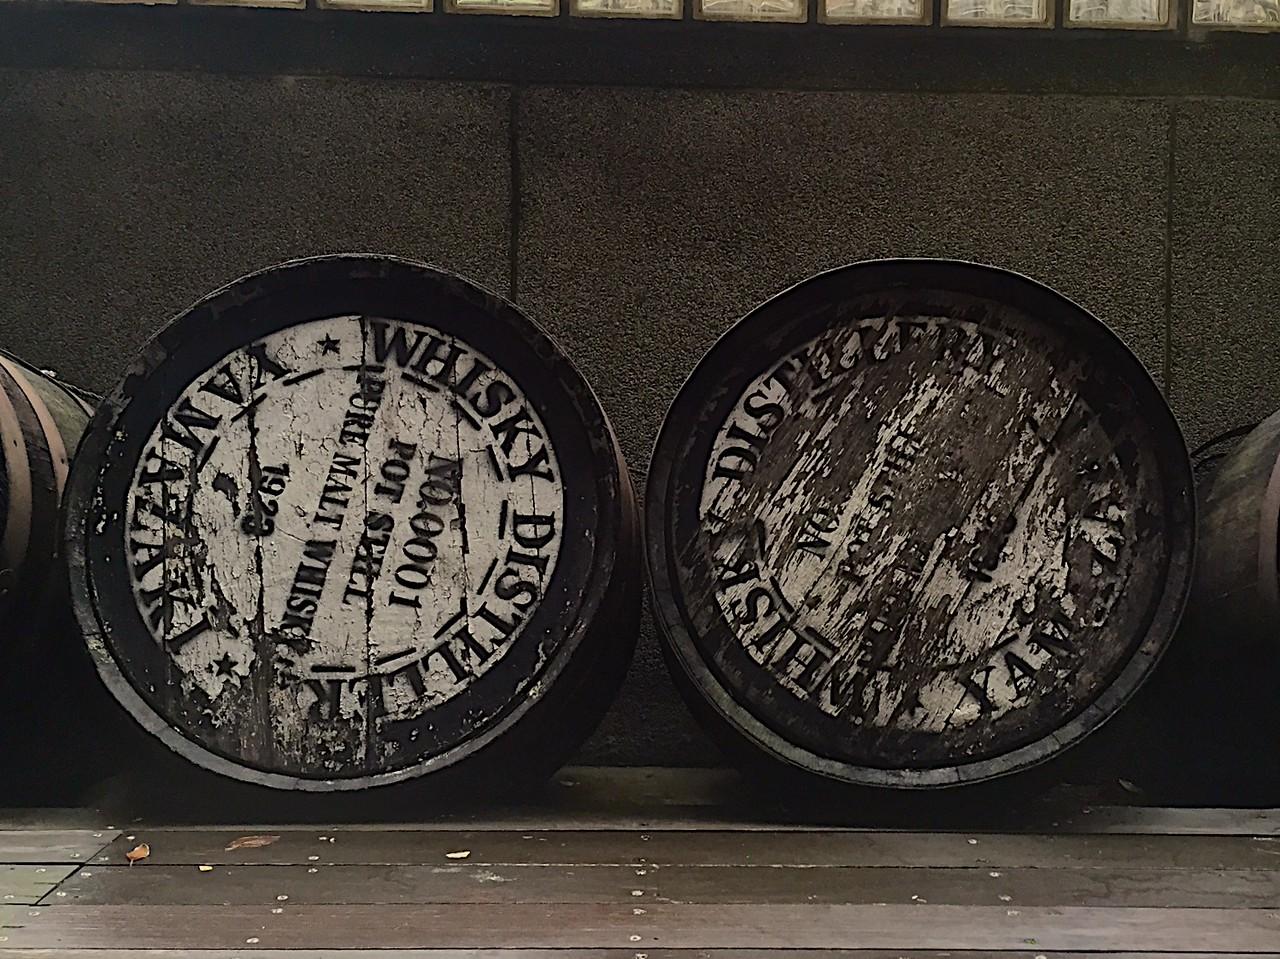 Old Yamasaki whiskey barrels on the patio at Libero.